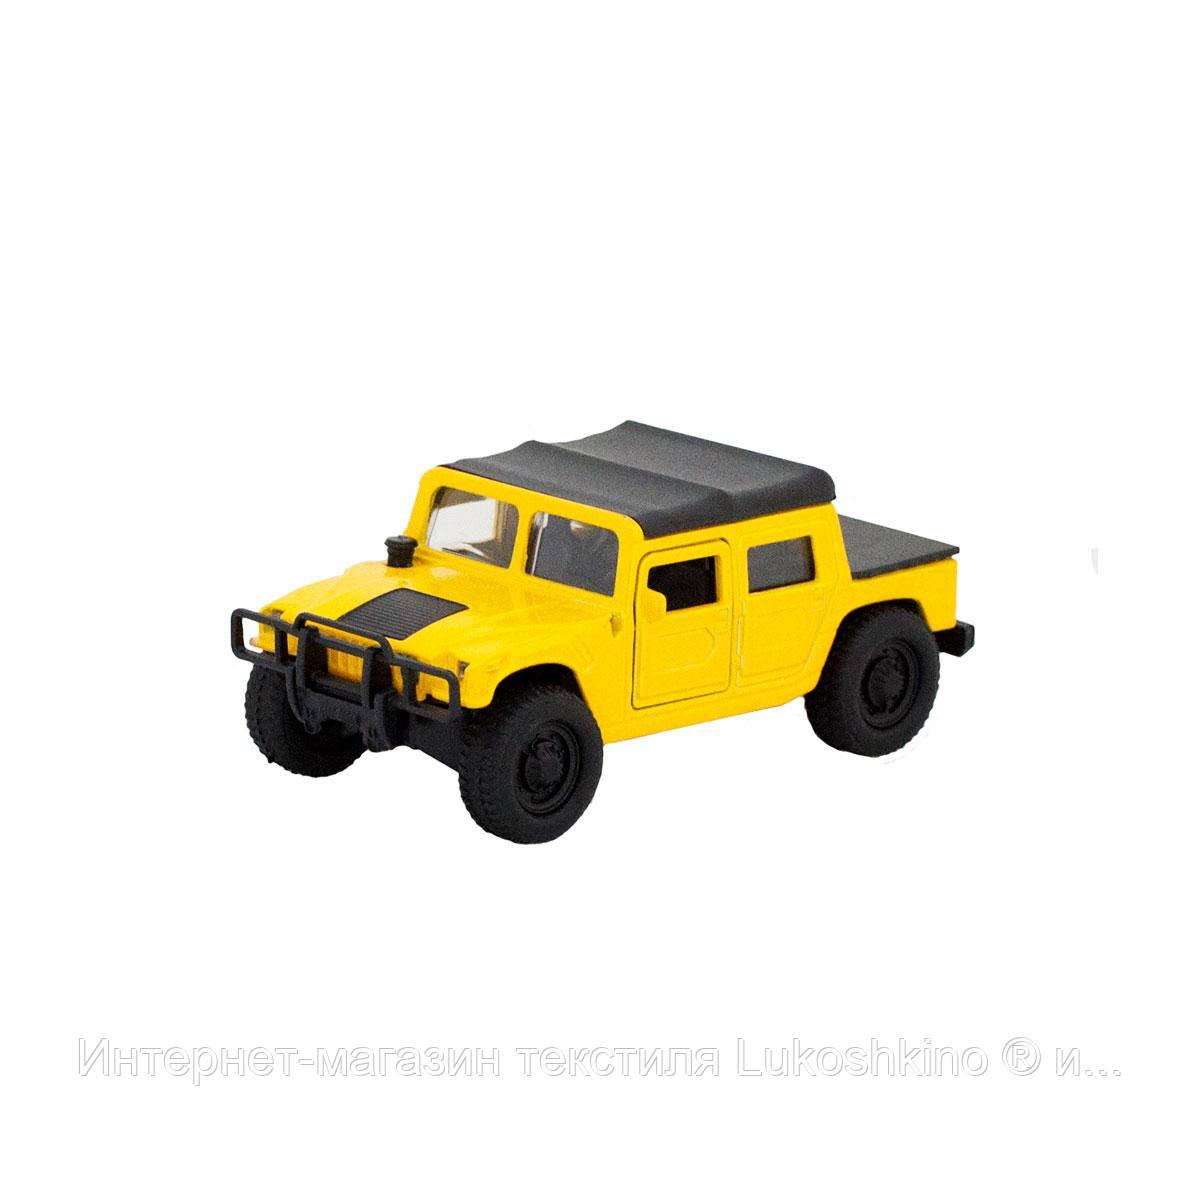 Автомодель - HUMMER H1 (жовтий)